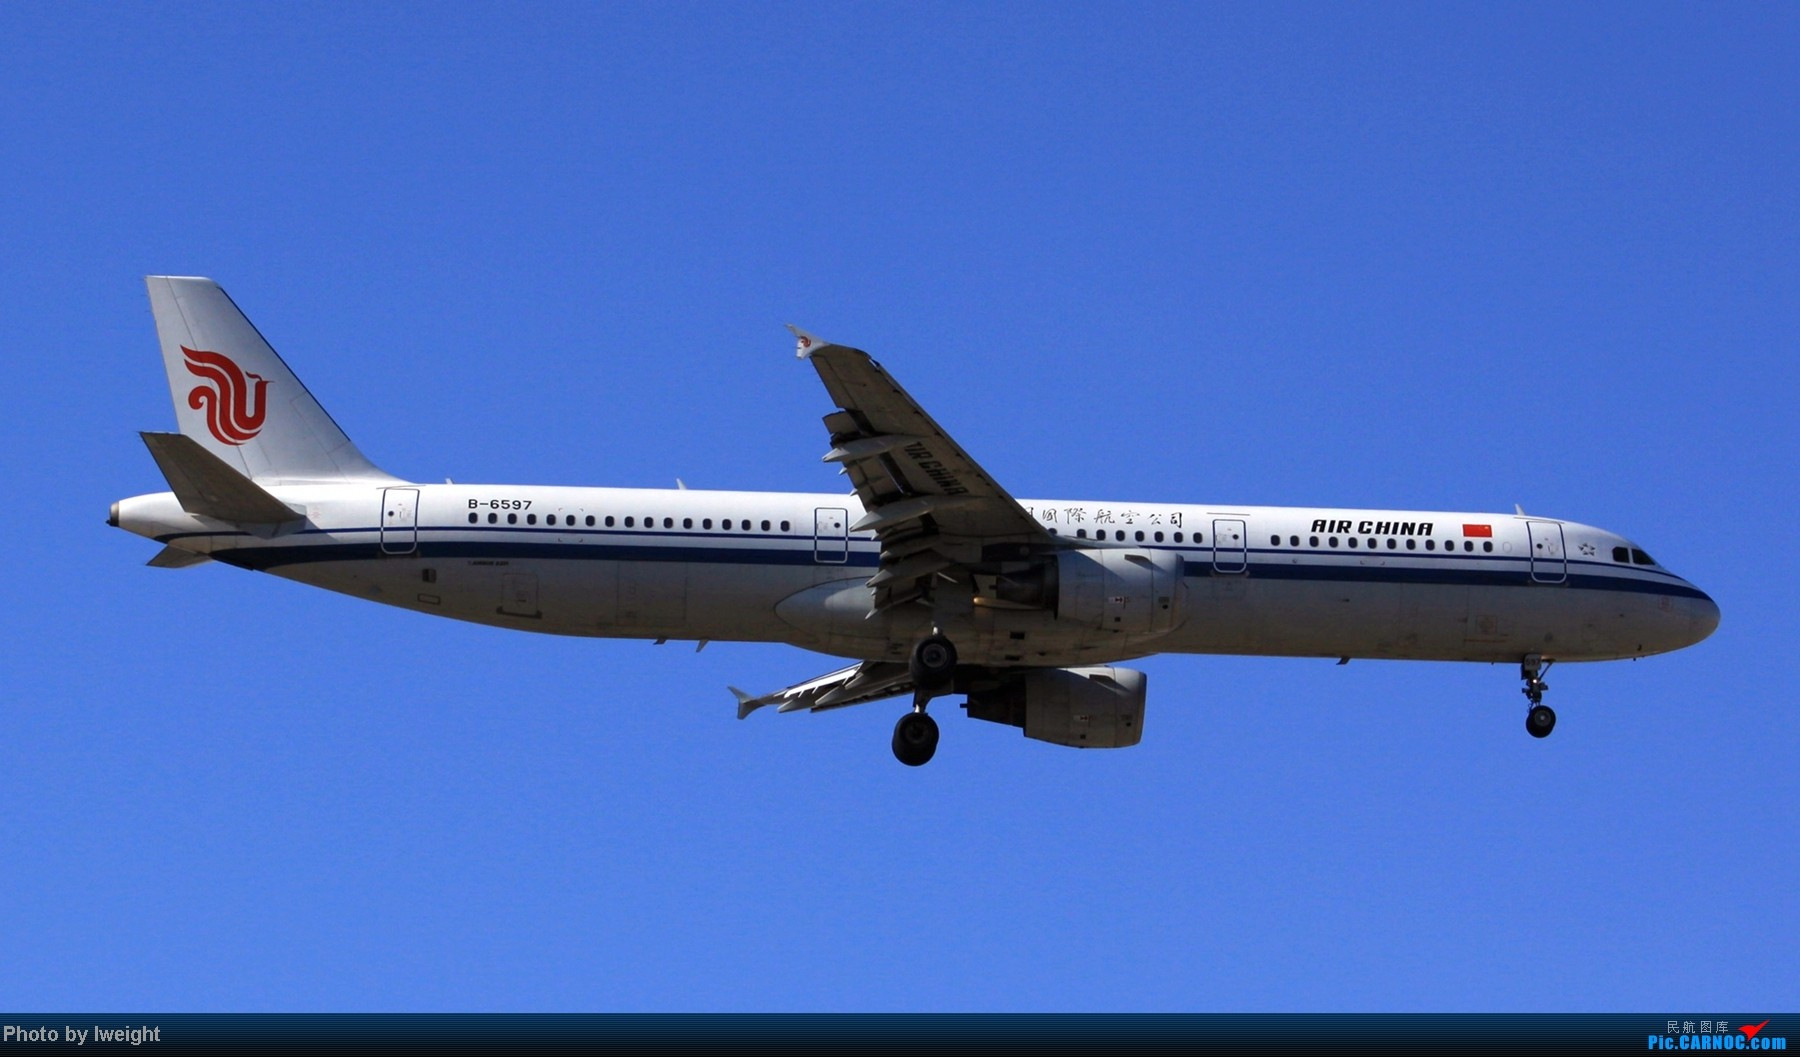 Re:[原创]春节期间首都机场拍机汇报 AIRBUS A321 B-6597 中国北京首都机场